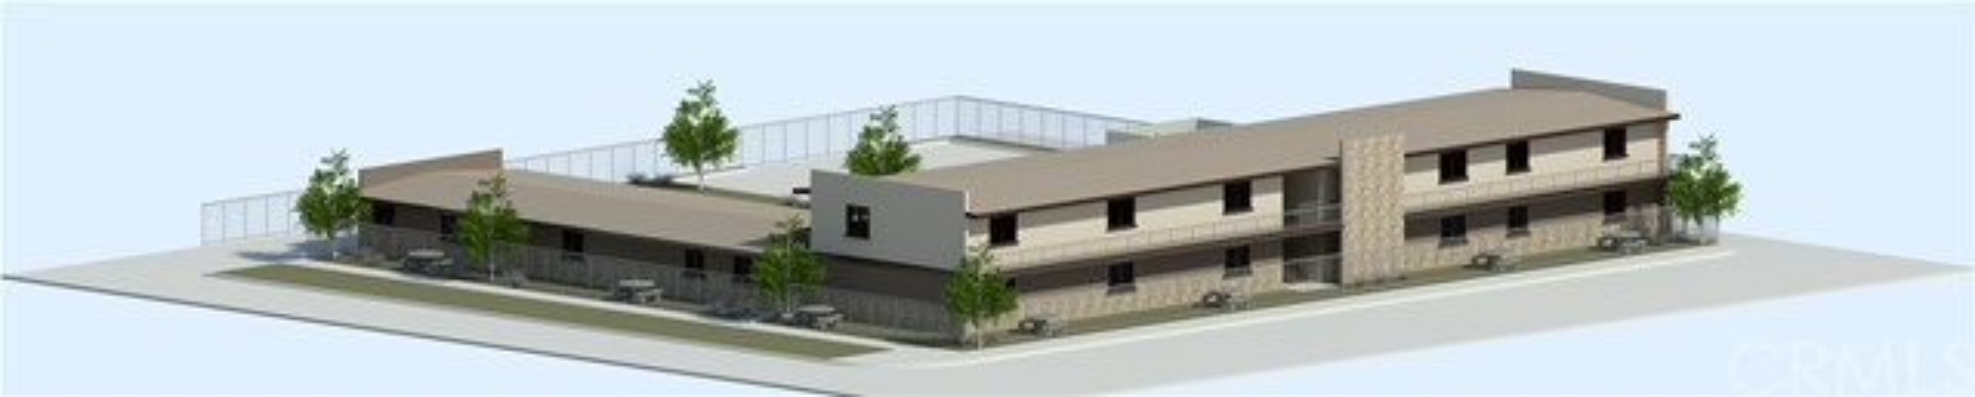 1600 N Arrowhead Avenue, San Bernardino, CA 92405